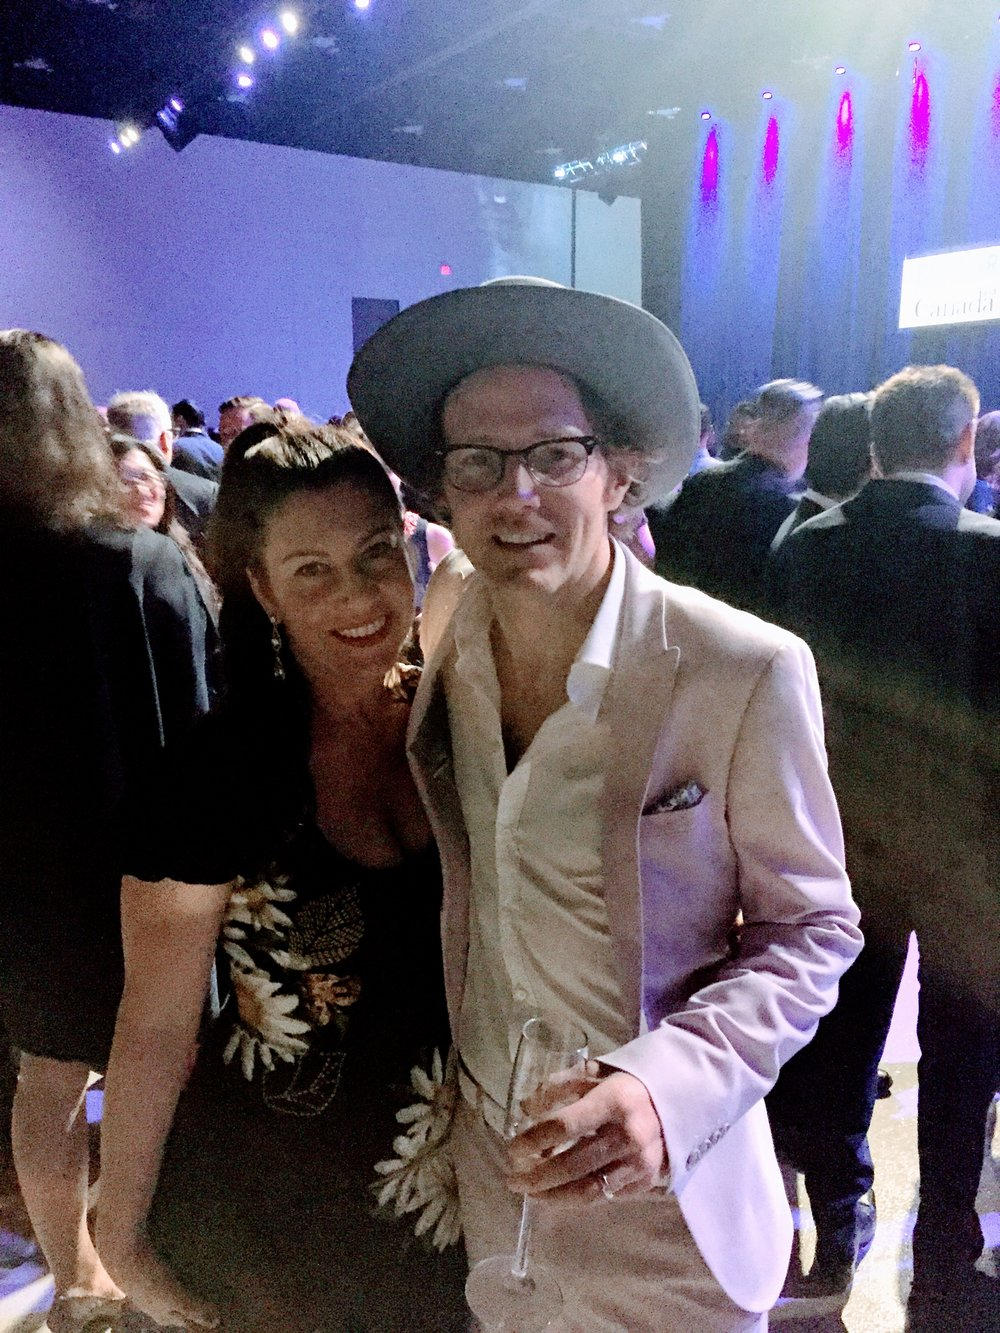 Luke Doucet of Whitehorse nominated (and won!) Adult Alternative Album of The Year.